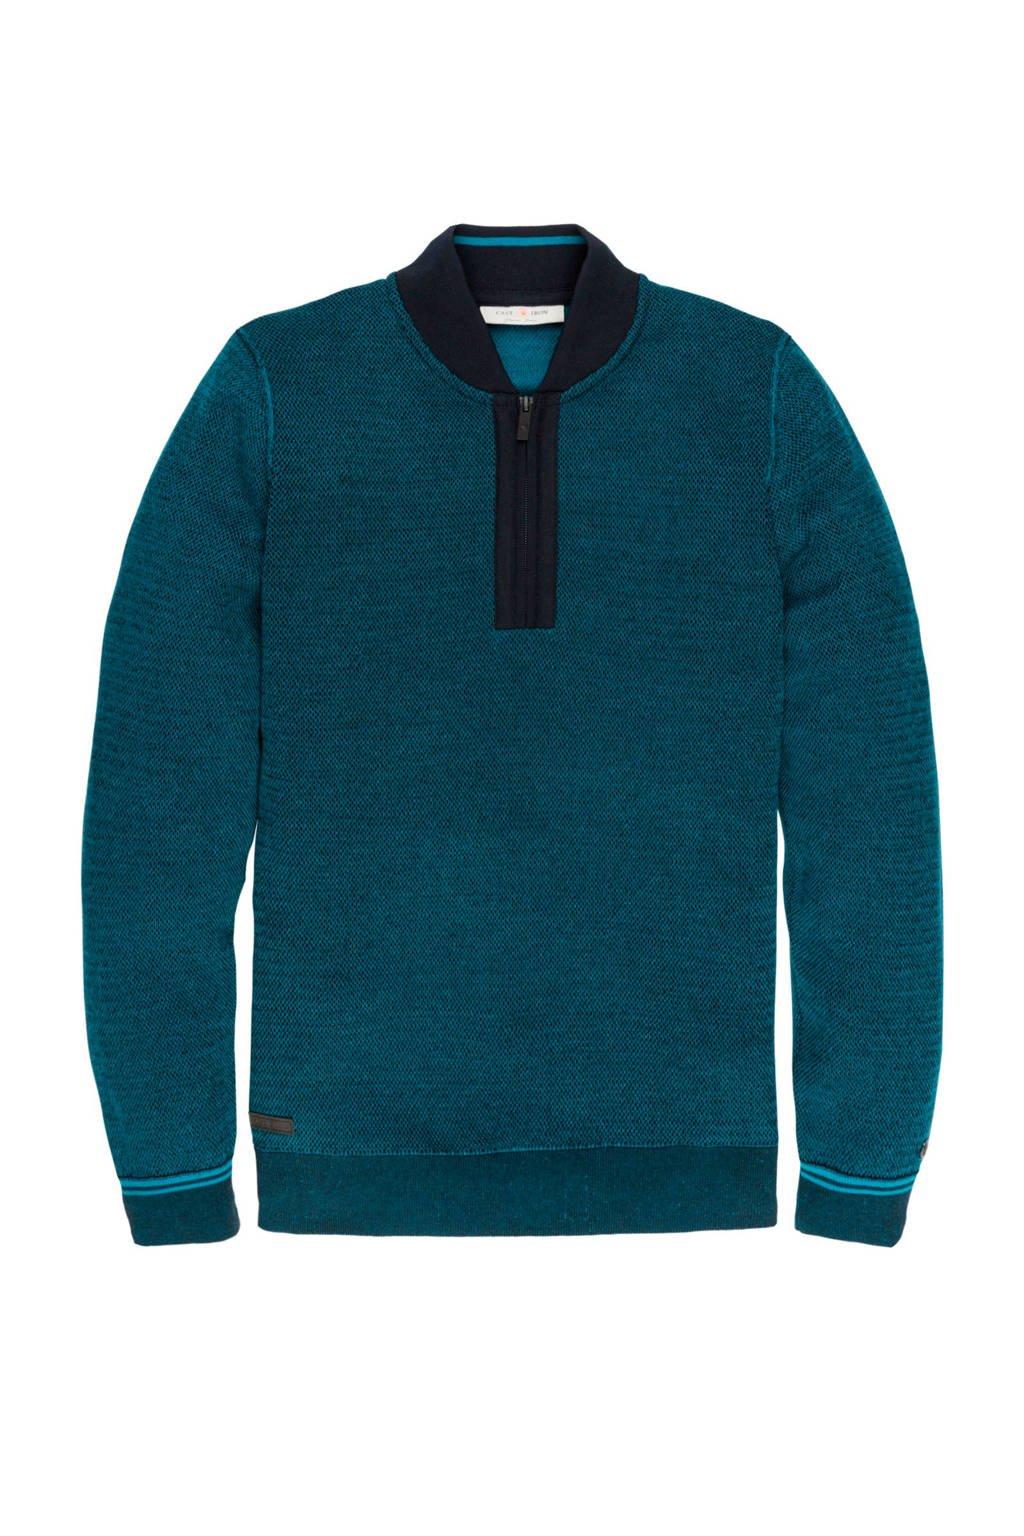 Cast Iron trui blauw, Blauw